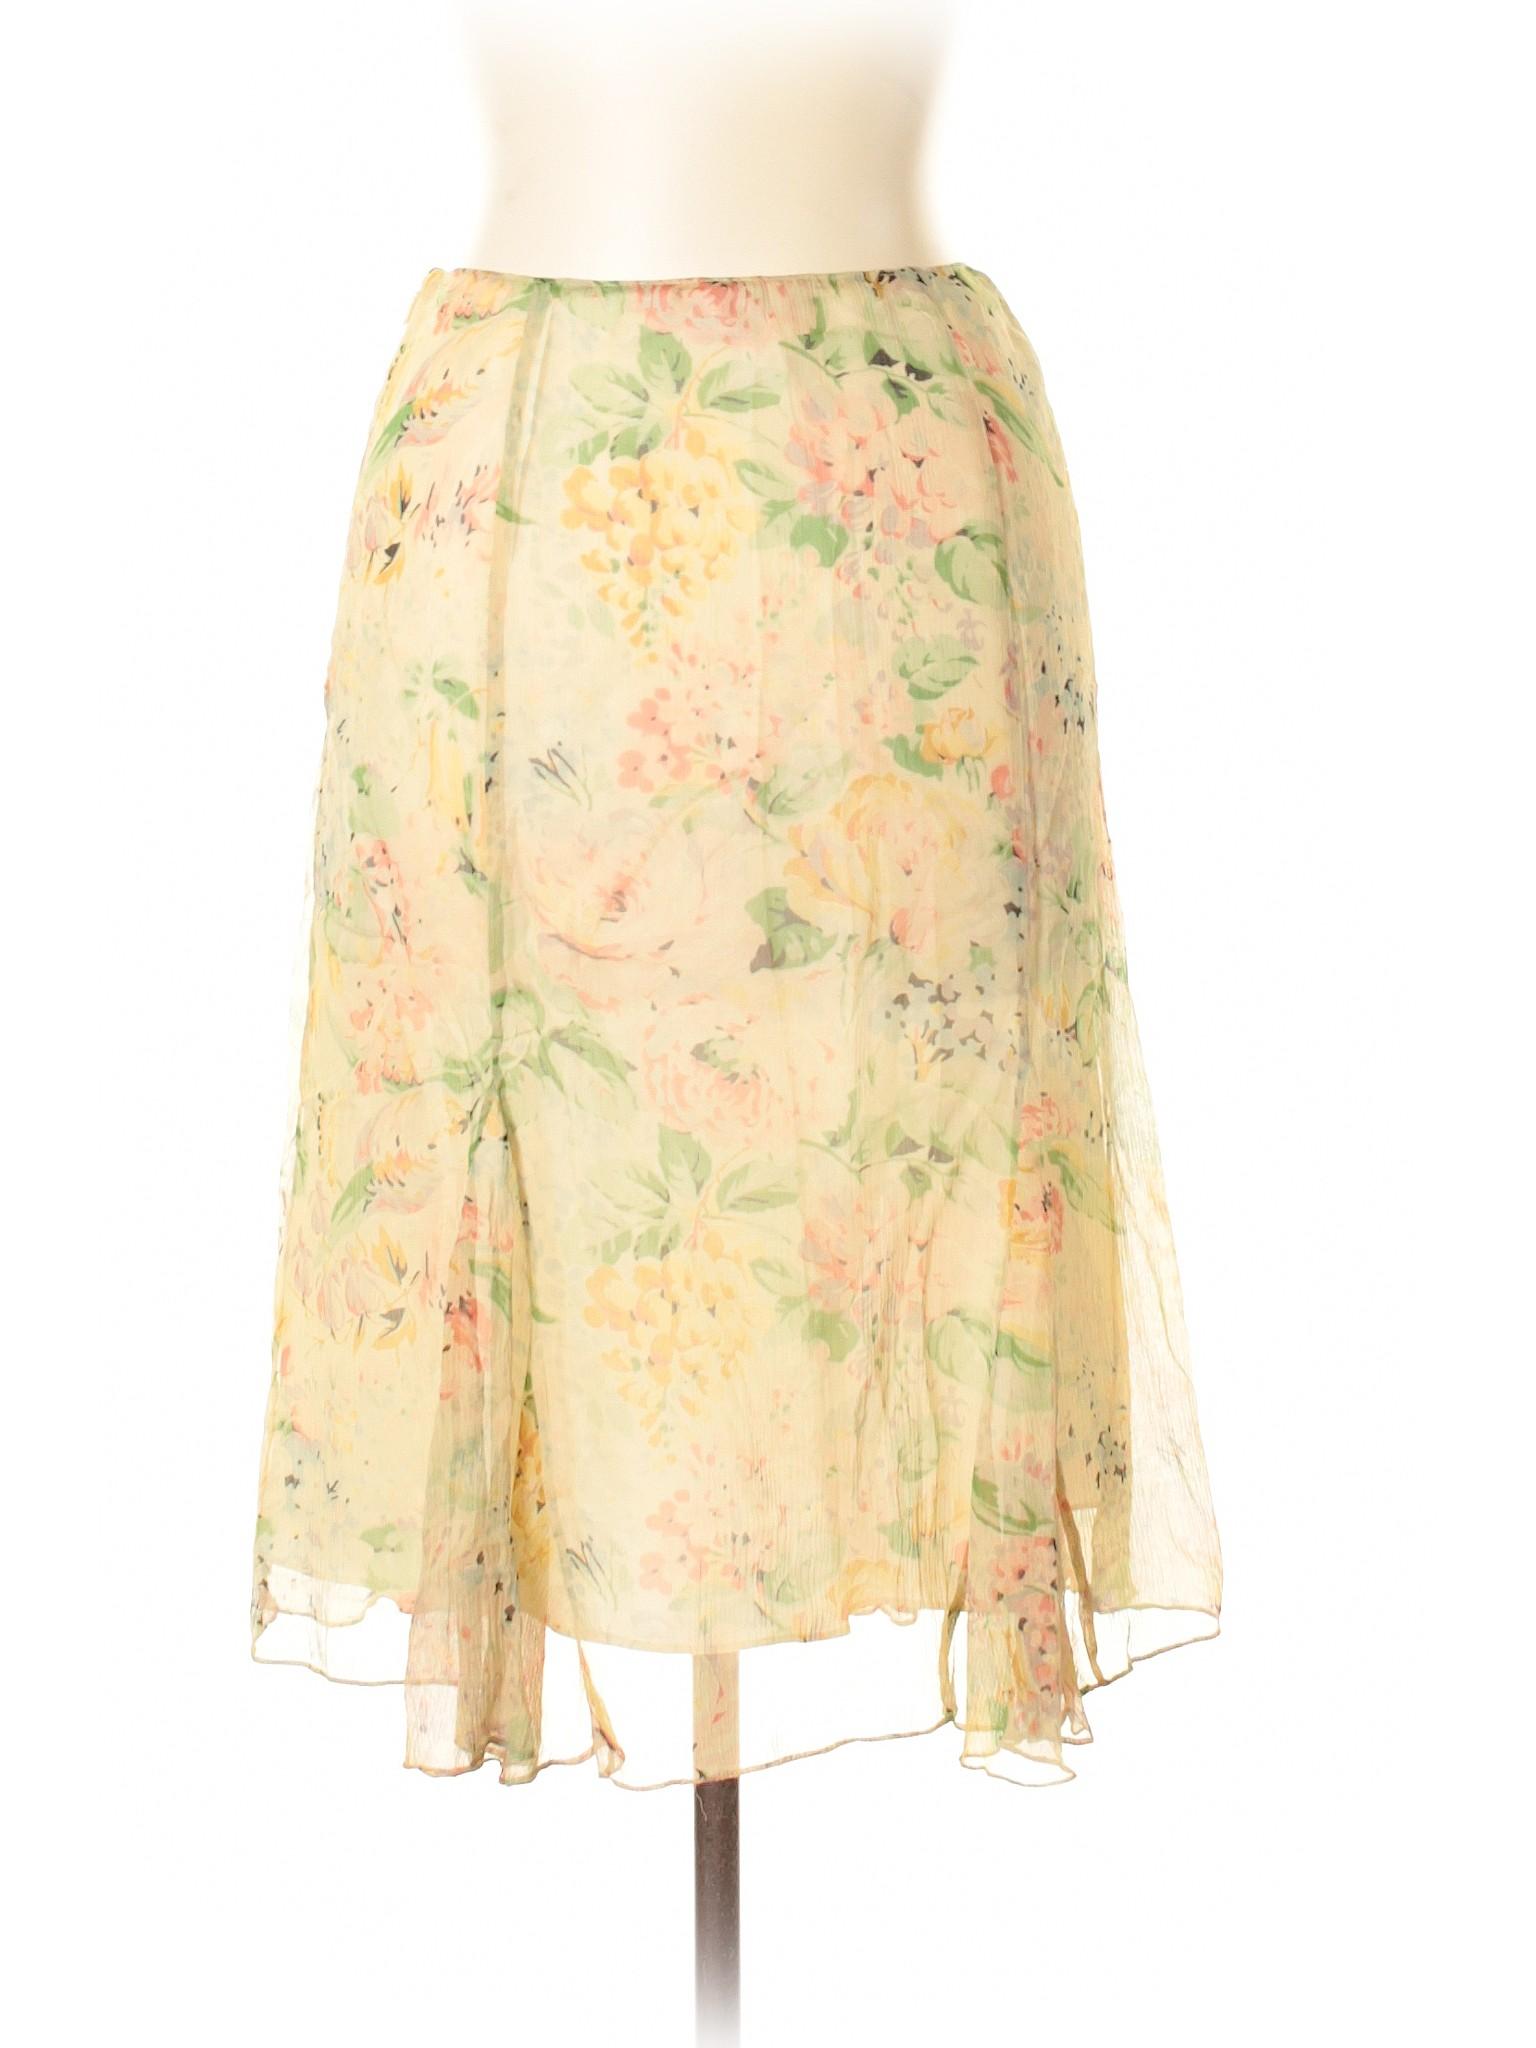 Skirt Silk Lauren Boutique Boutique Ralph Ralph Rnzqx1wPZ